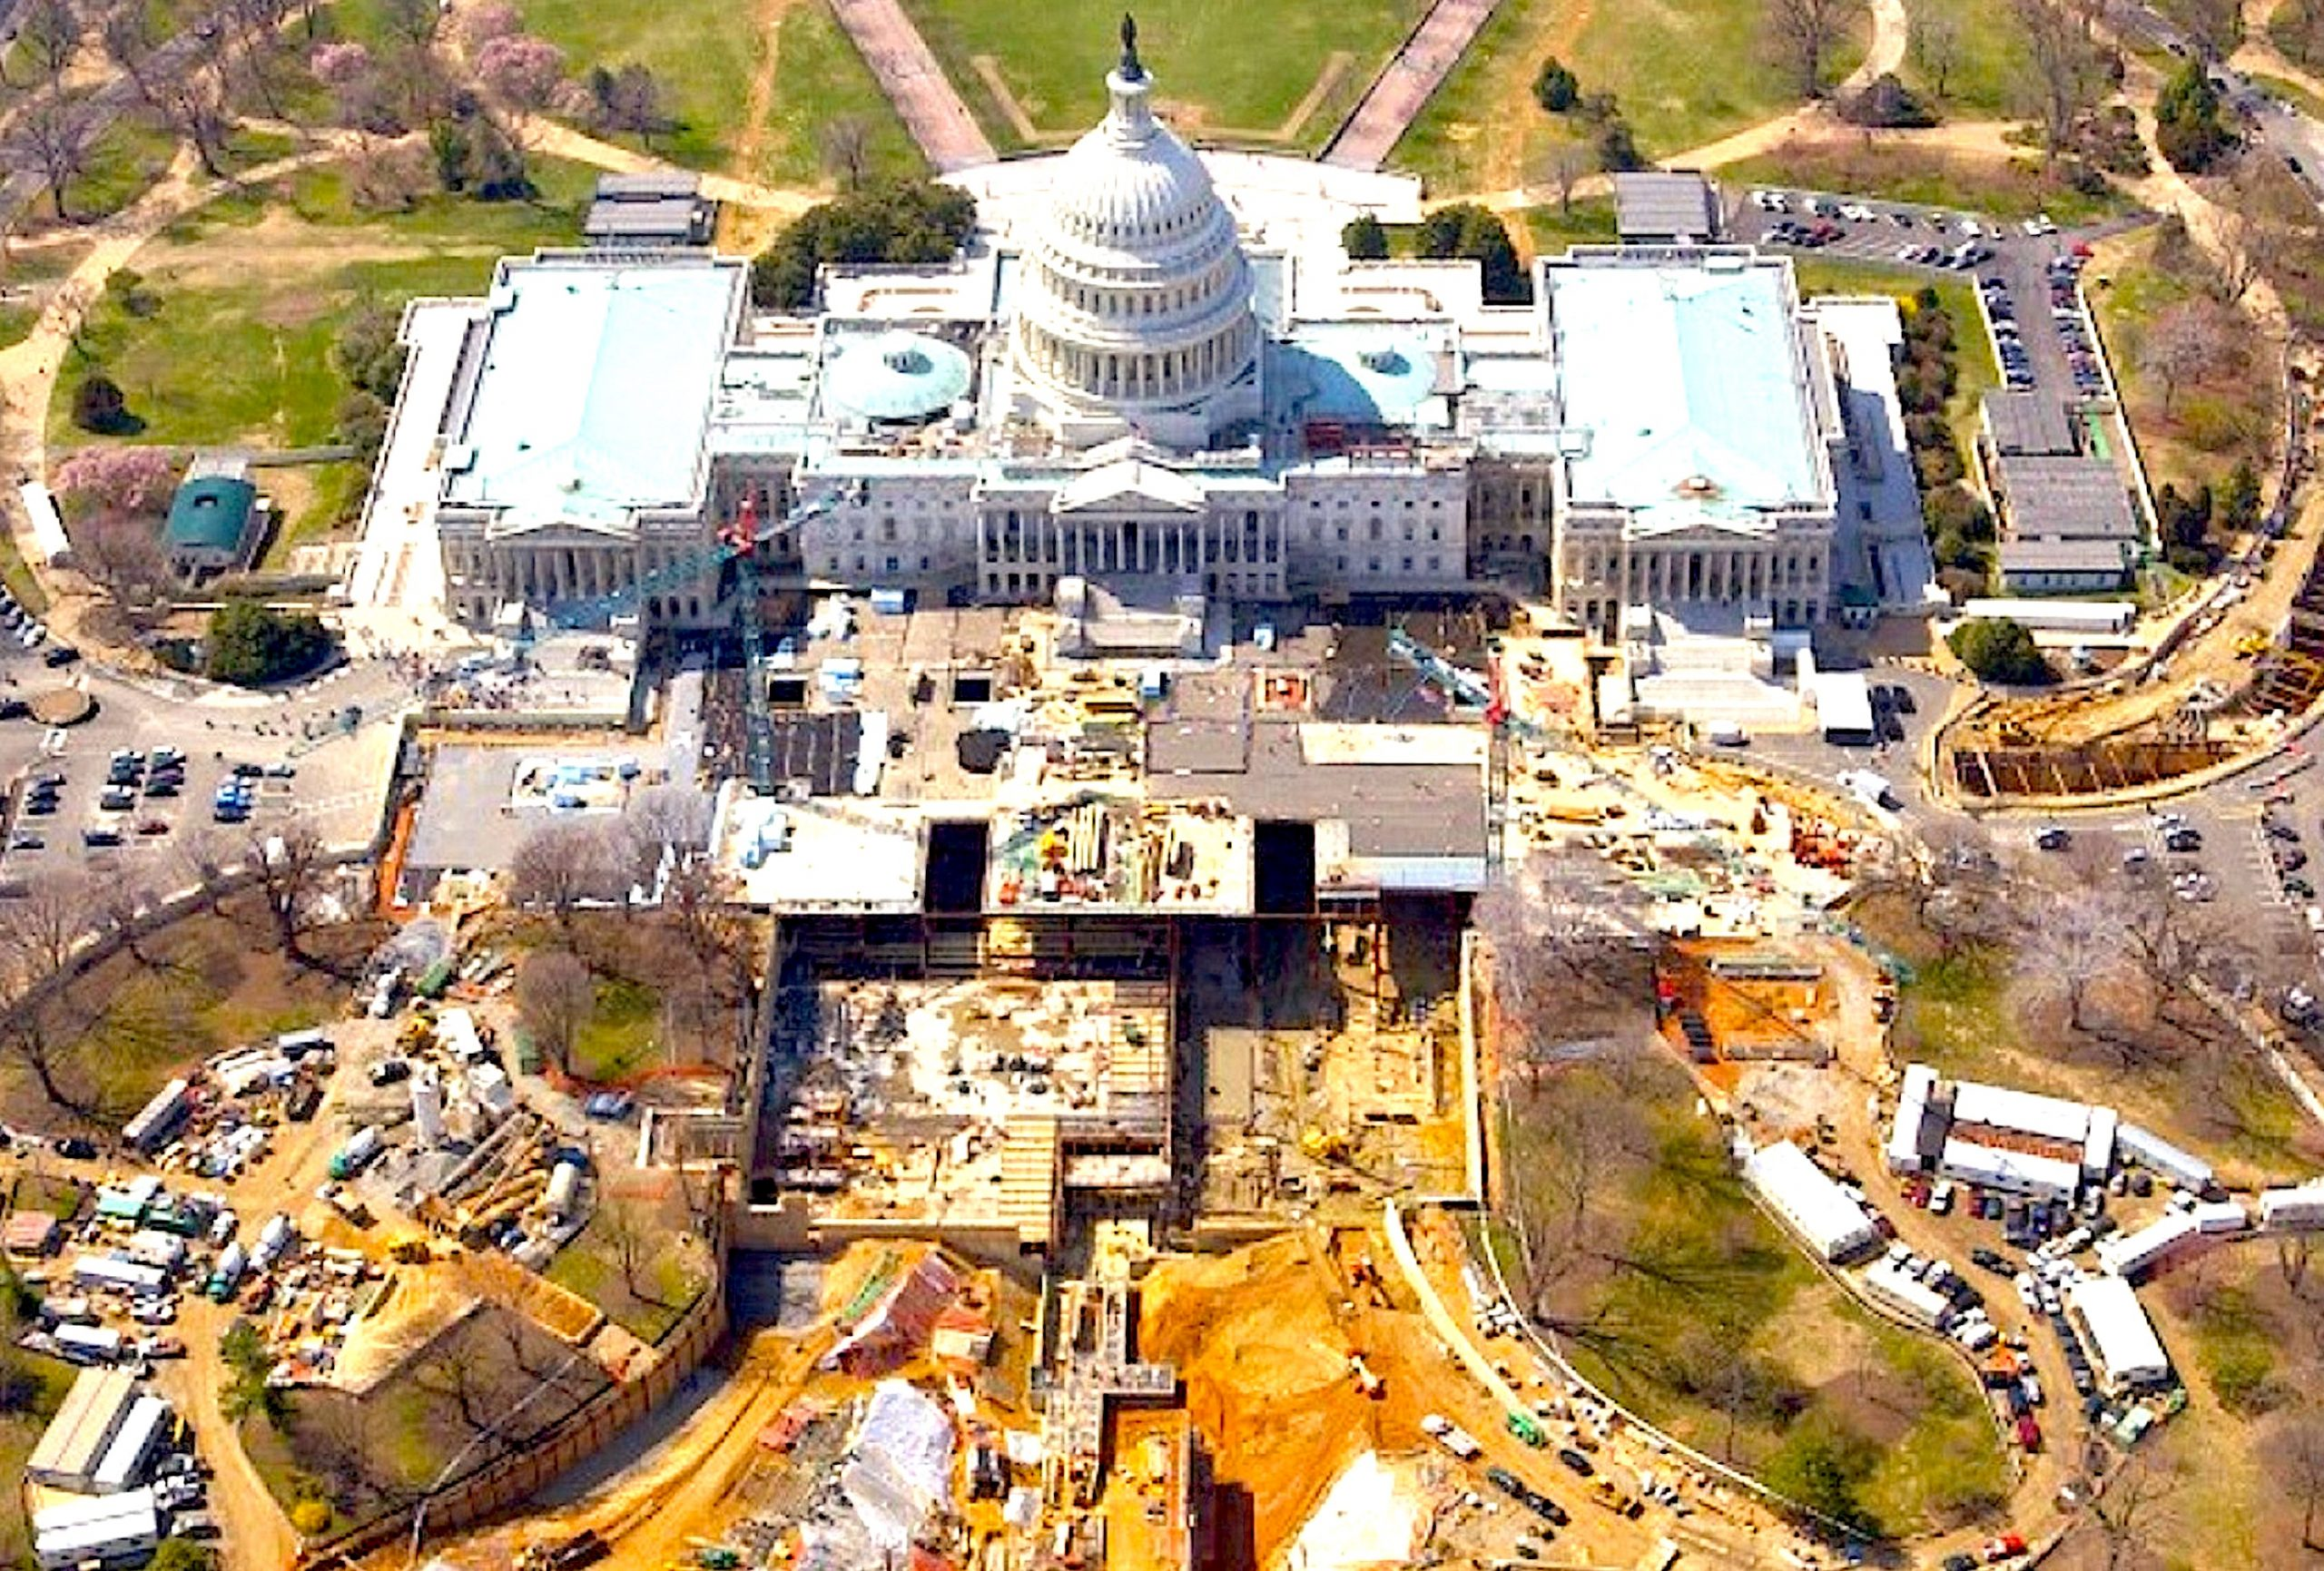 Washington Tunnels – The DC Underground Atlas